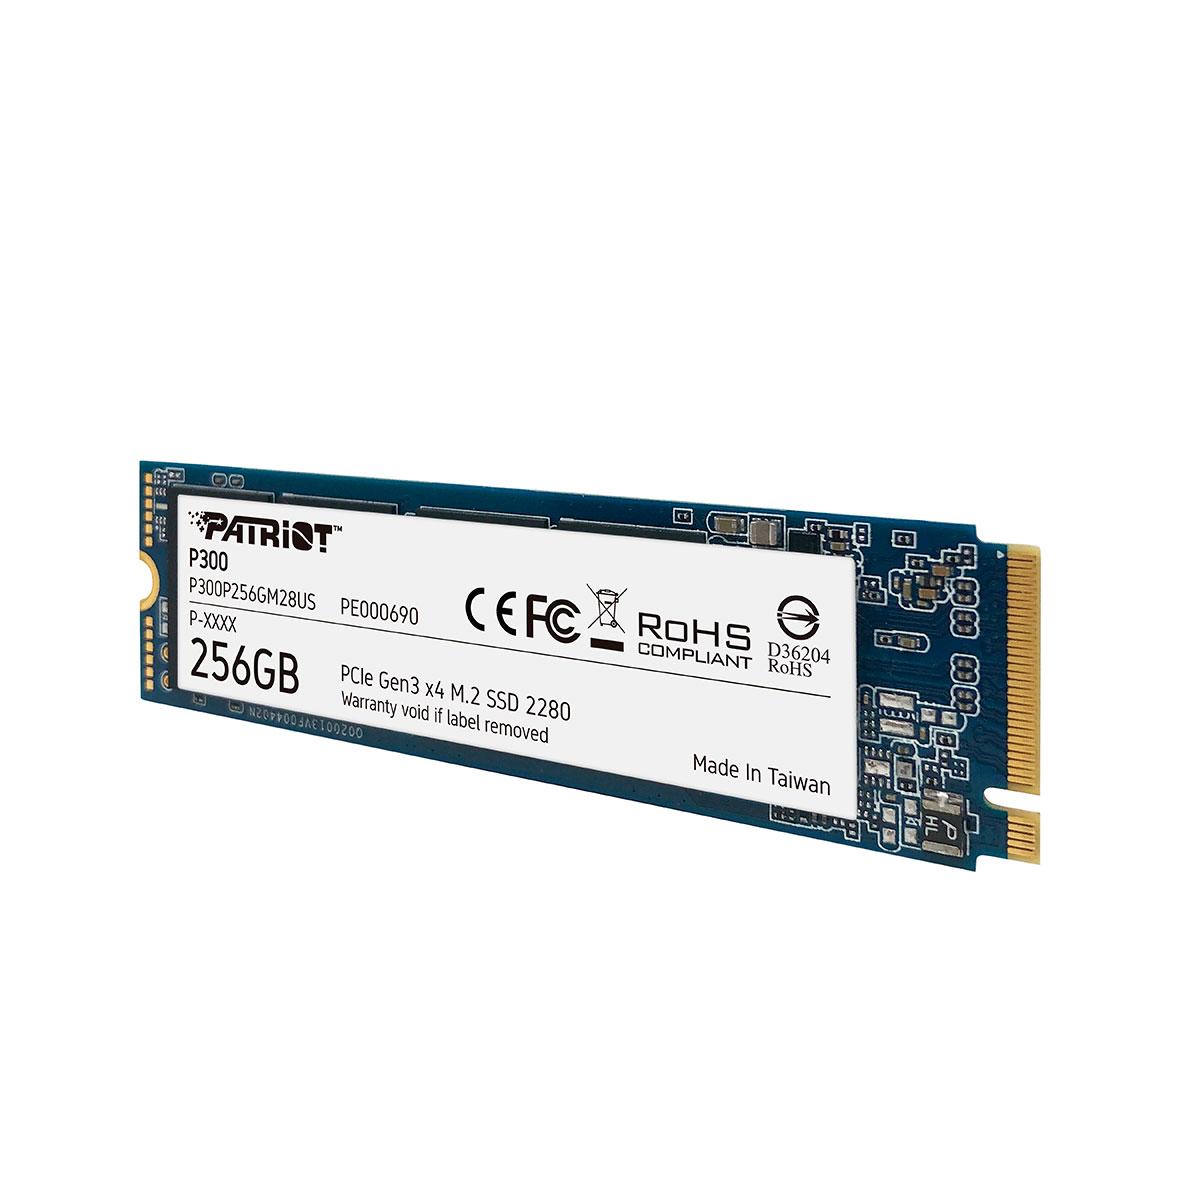 HD SSD M.2 2280 Patriot P300 256GB PCIe Gen3 x4 NVMe 1.3 Leitura 1700 MB/s, Gravação 1100 MB/s